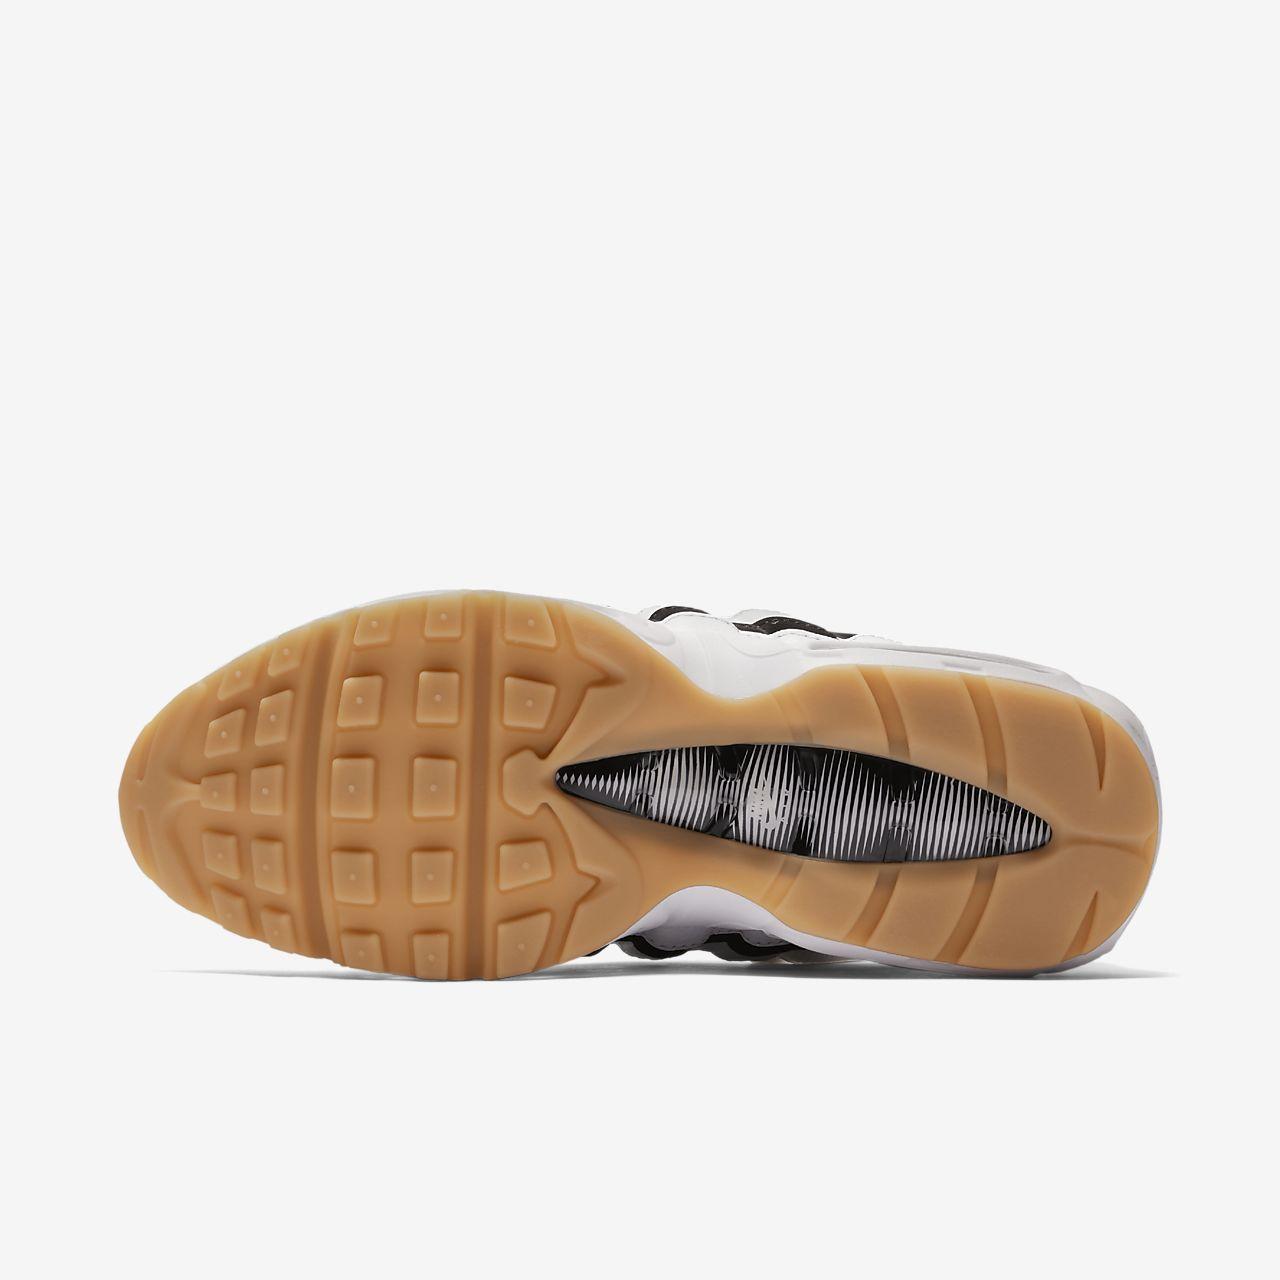 scarpa nike air max 95 og biancogum light brownnero 307960 112